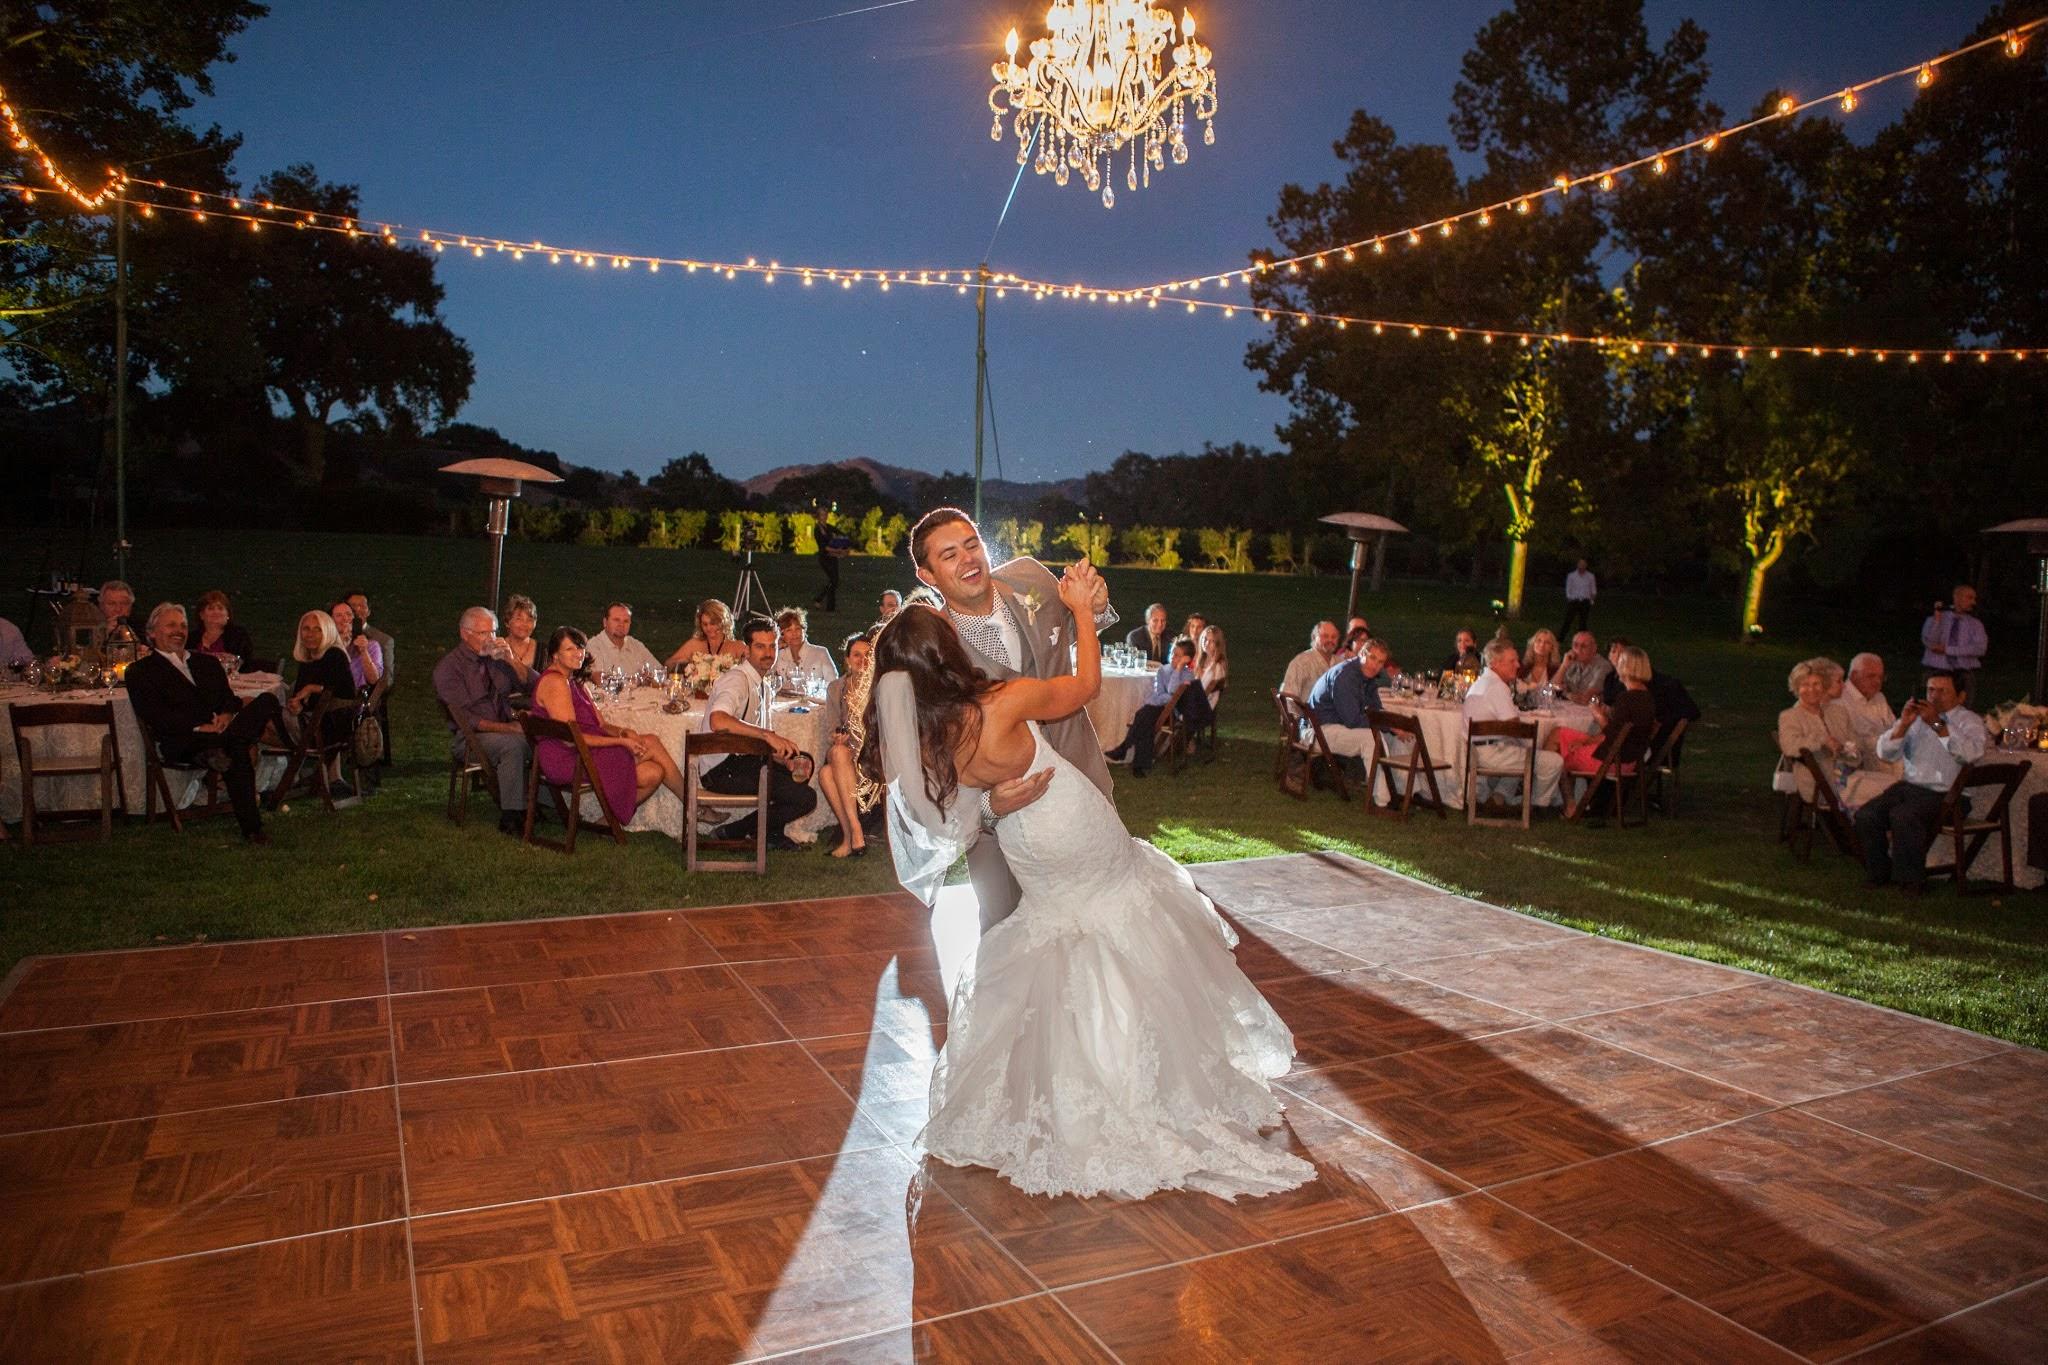 www.santabarbarawedding.com | Fess Parker Winery Location Spotlight | Waller Weddings | Wine Country Wedding | Dancing and Dance Floor